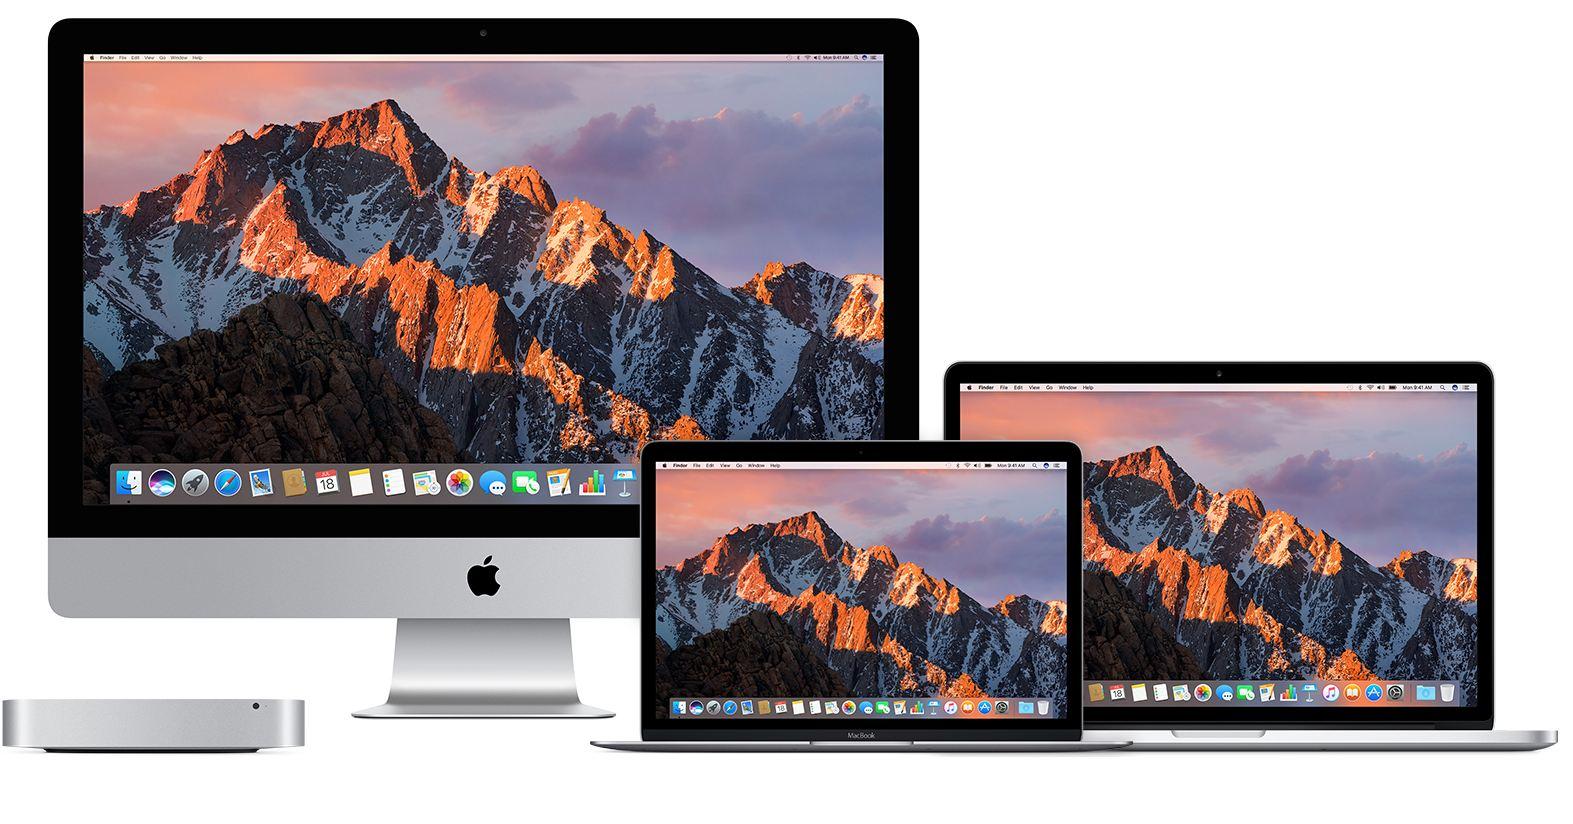 How to downgrade macOS Sierra